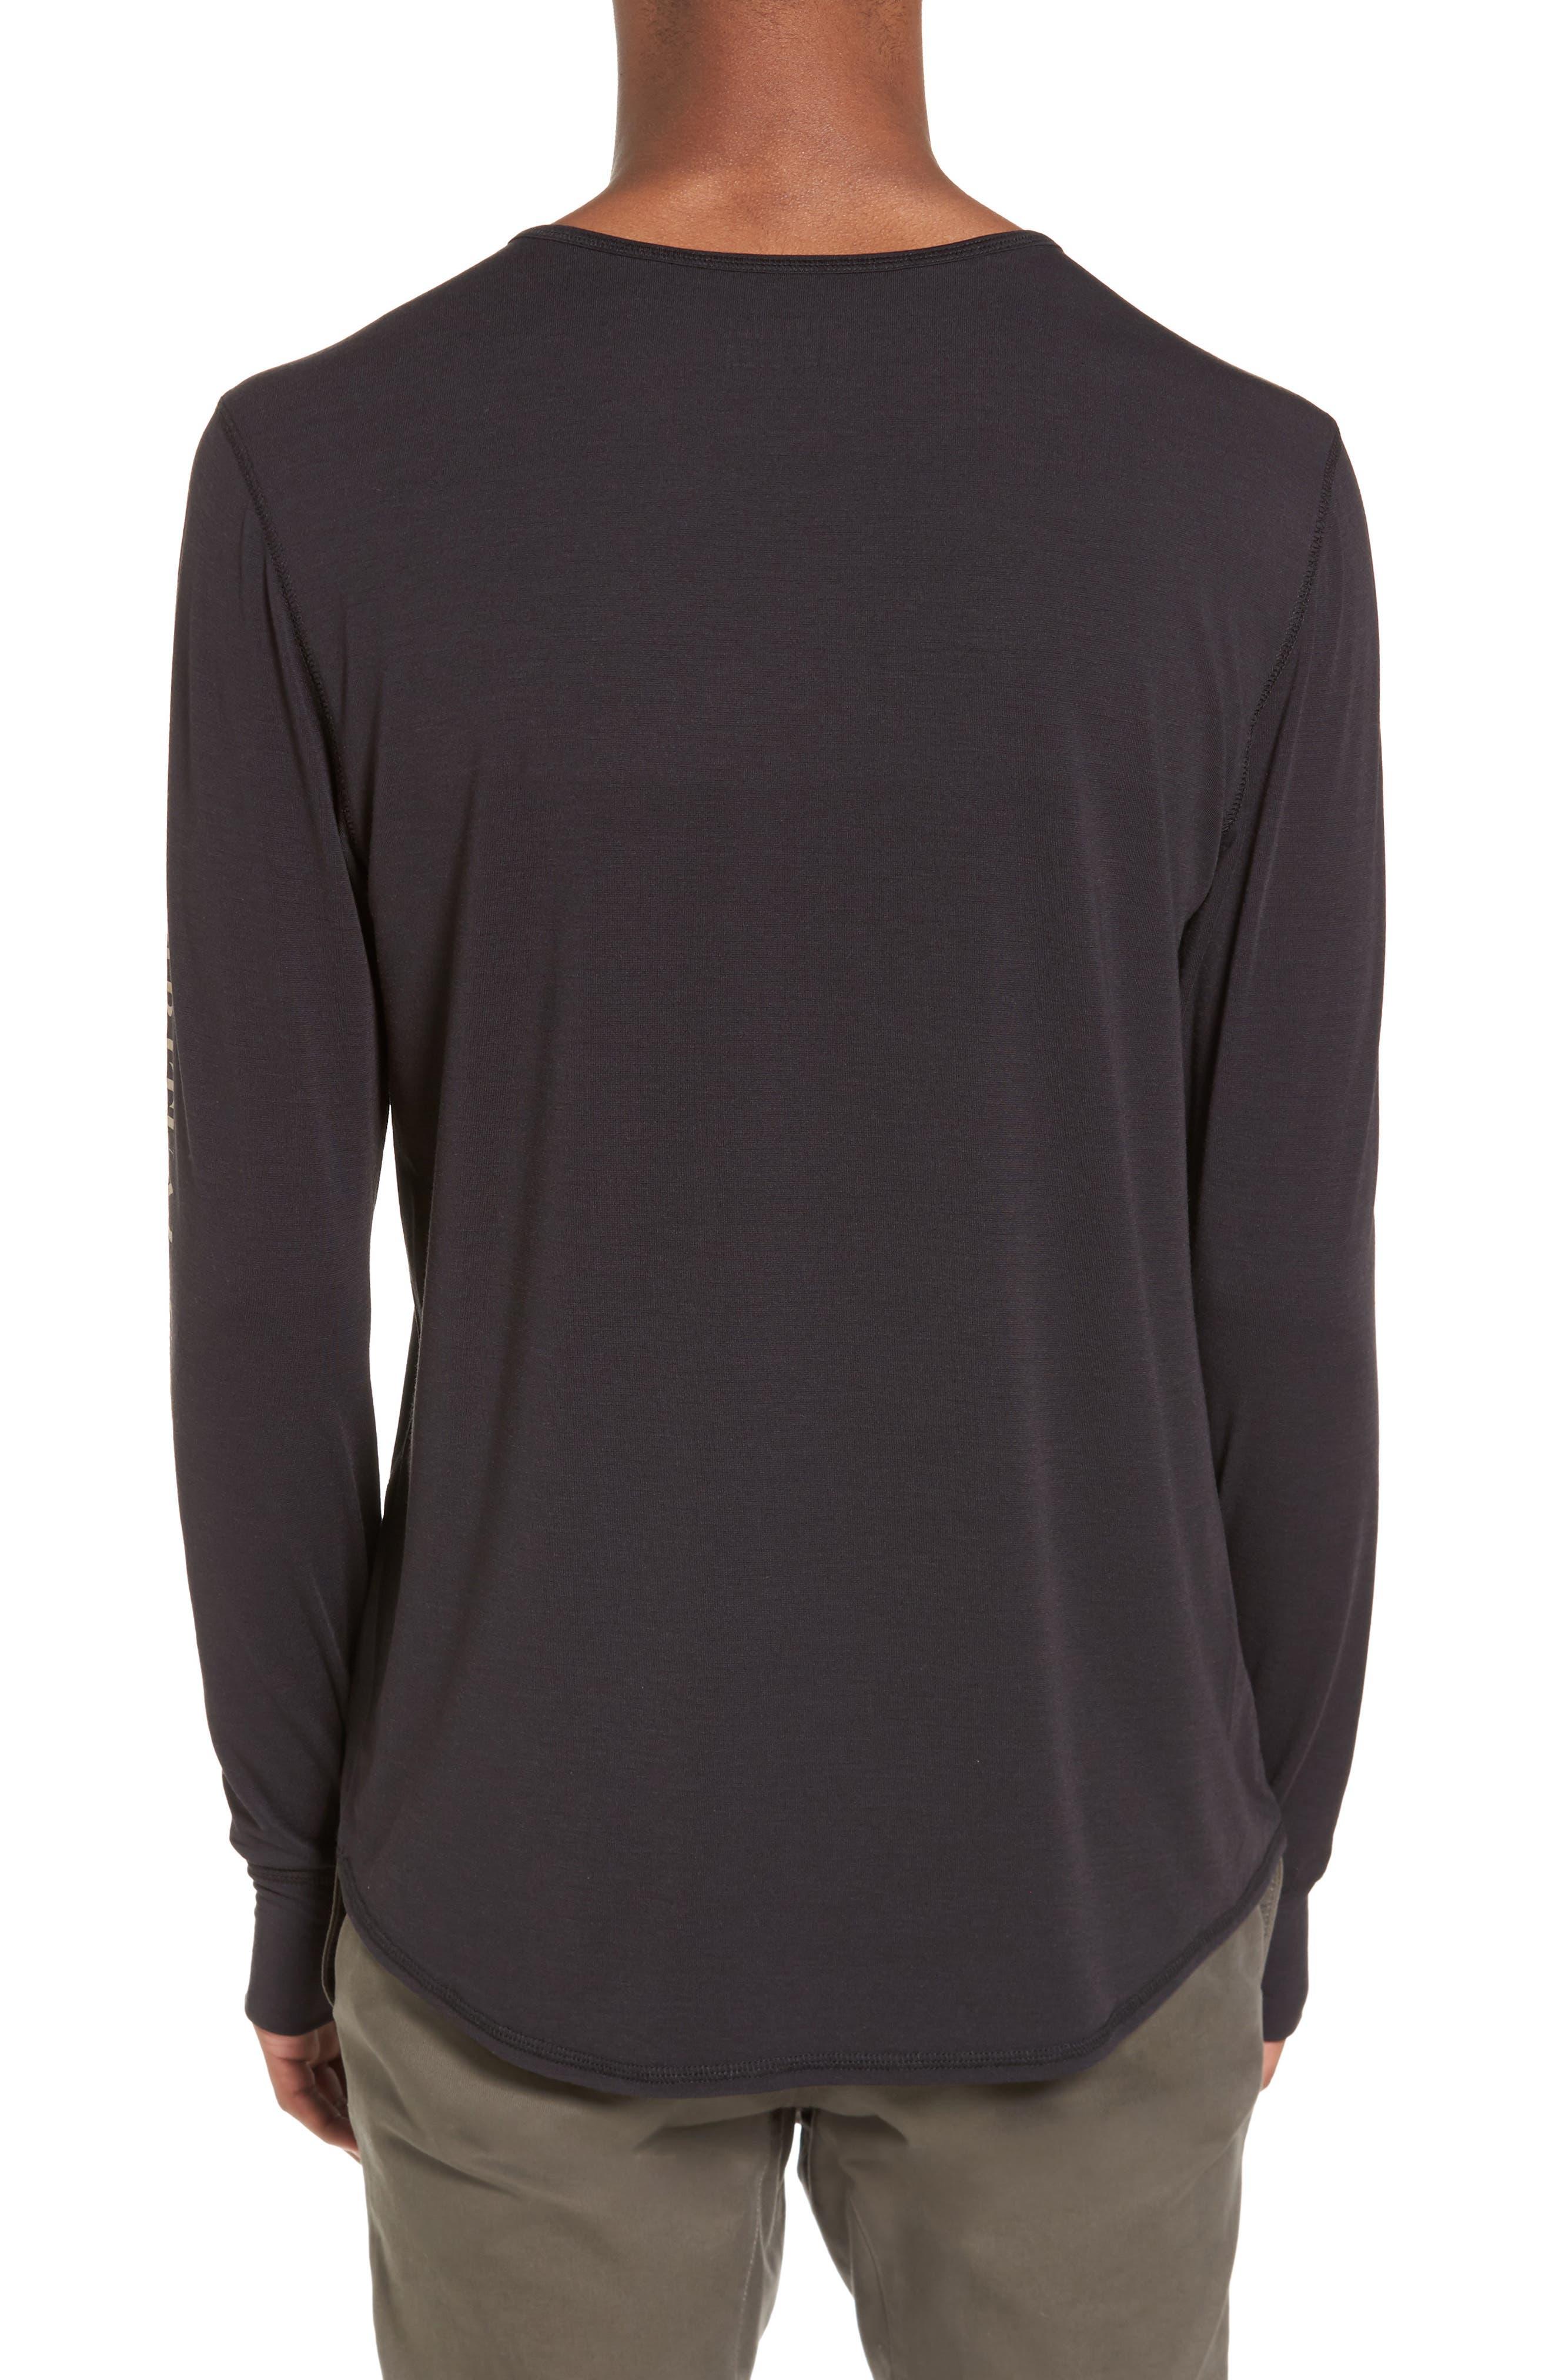 Yantra Wave T-Shirt,                             Alternate thumbnail 2, color,                             Black/ Black